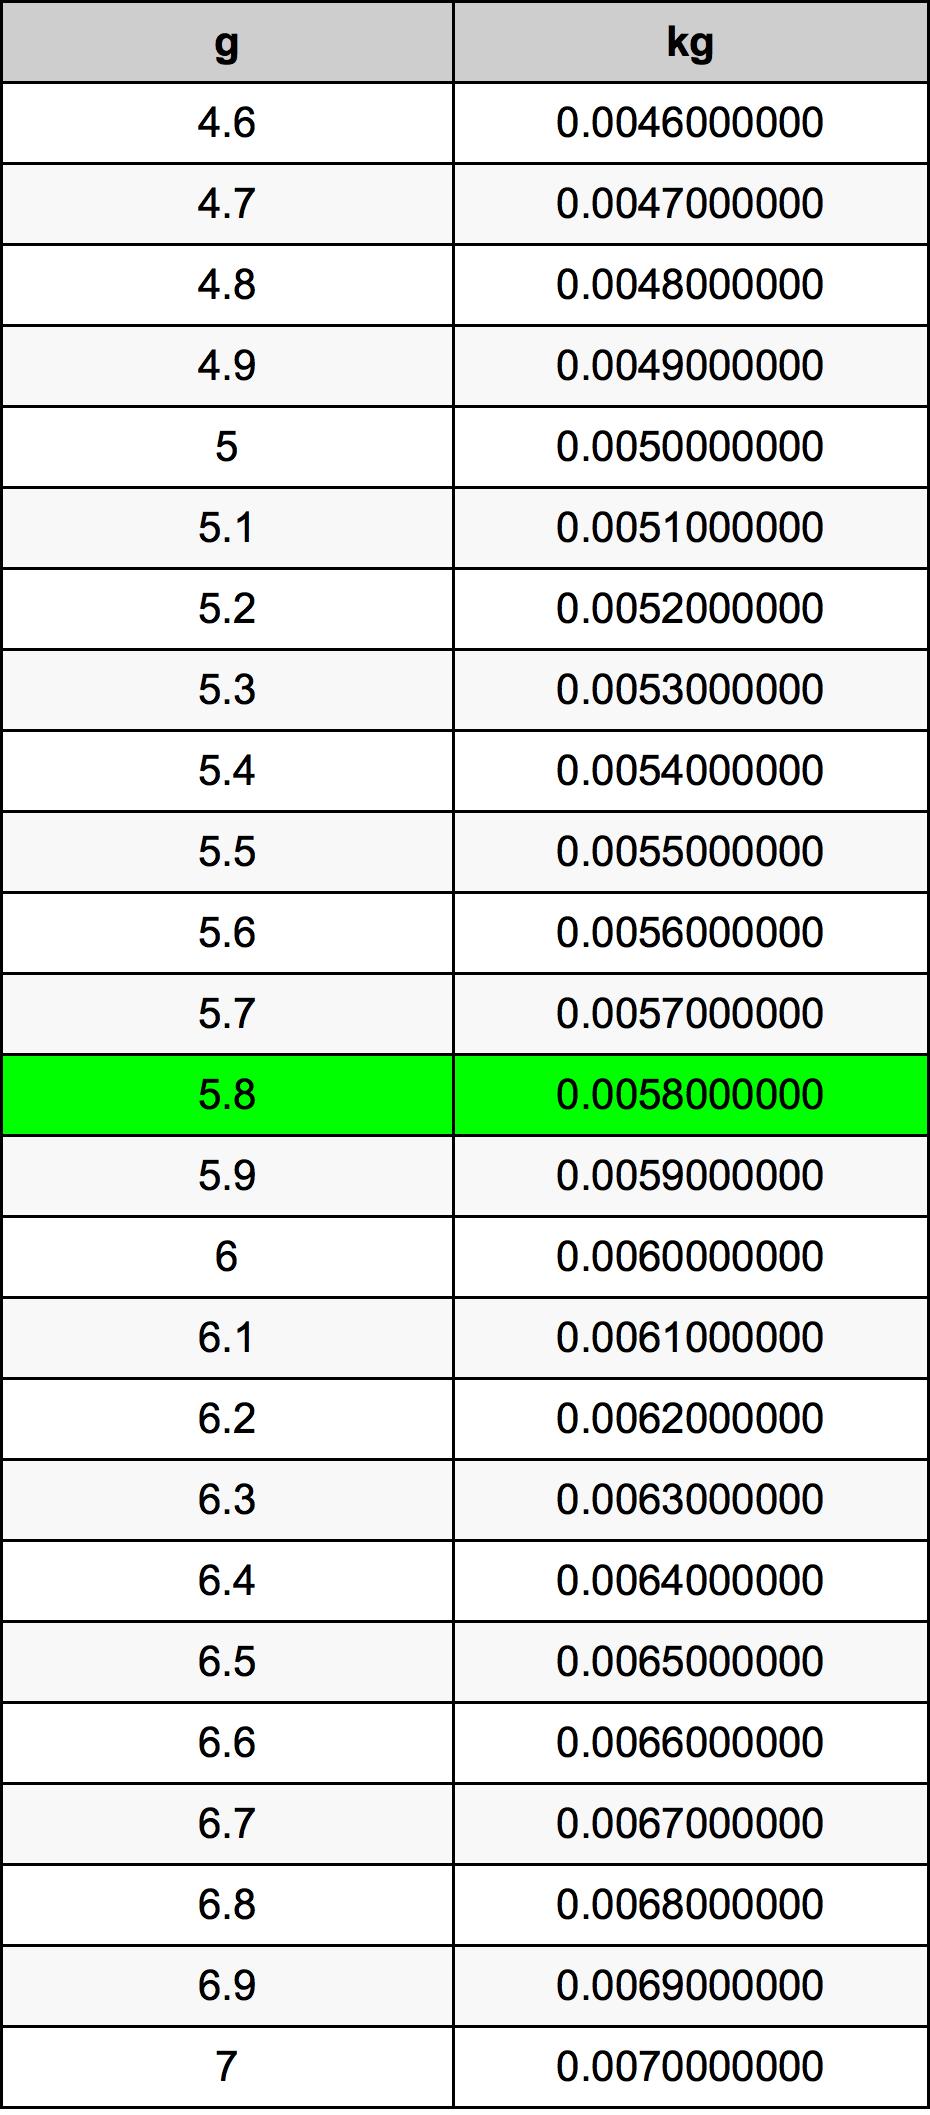 5 8 Grams To Kilograms Converter 5 8 G To Kg Converter Kilograms To Pounds Conversion